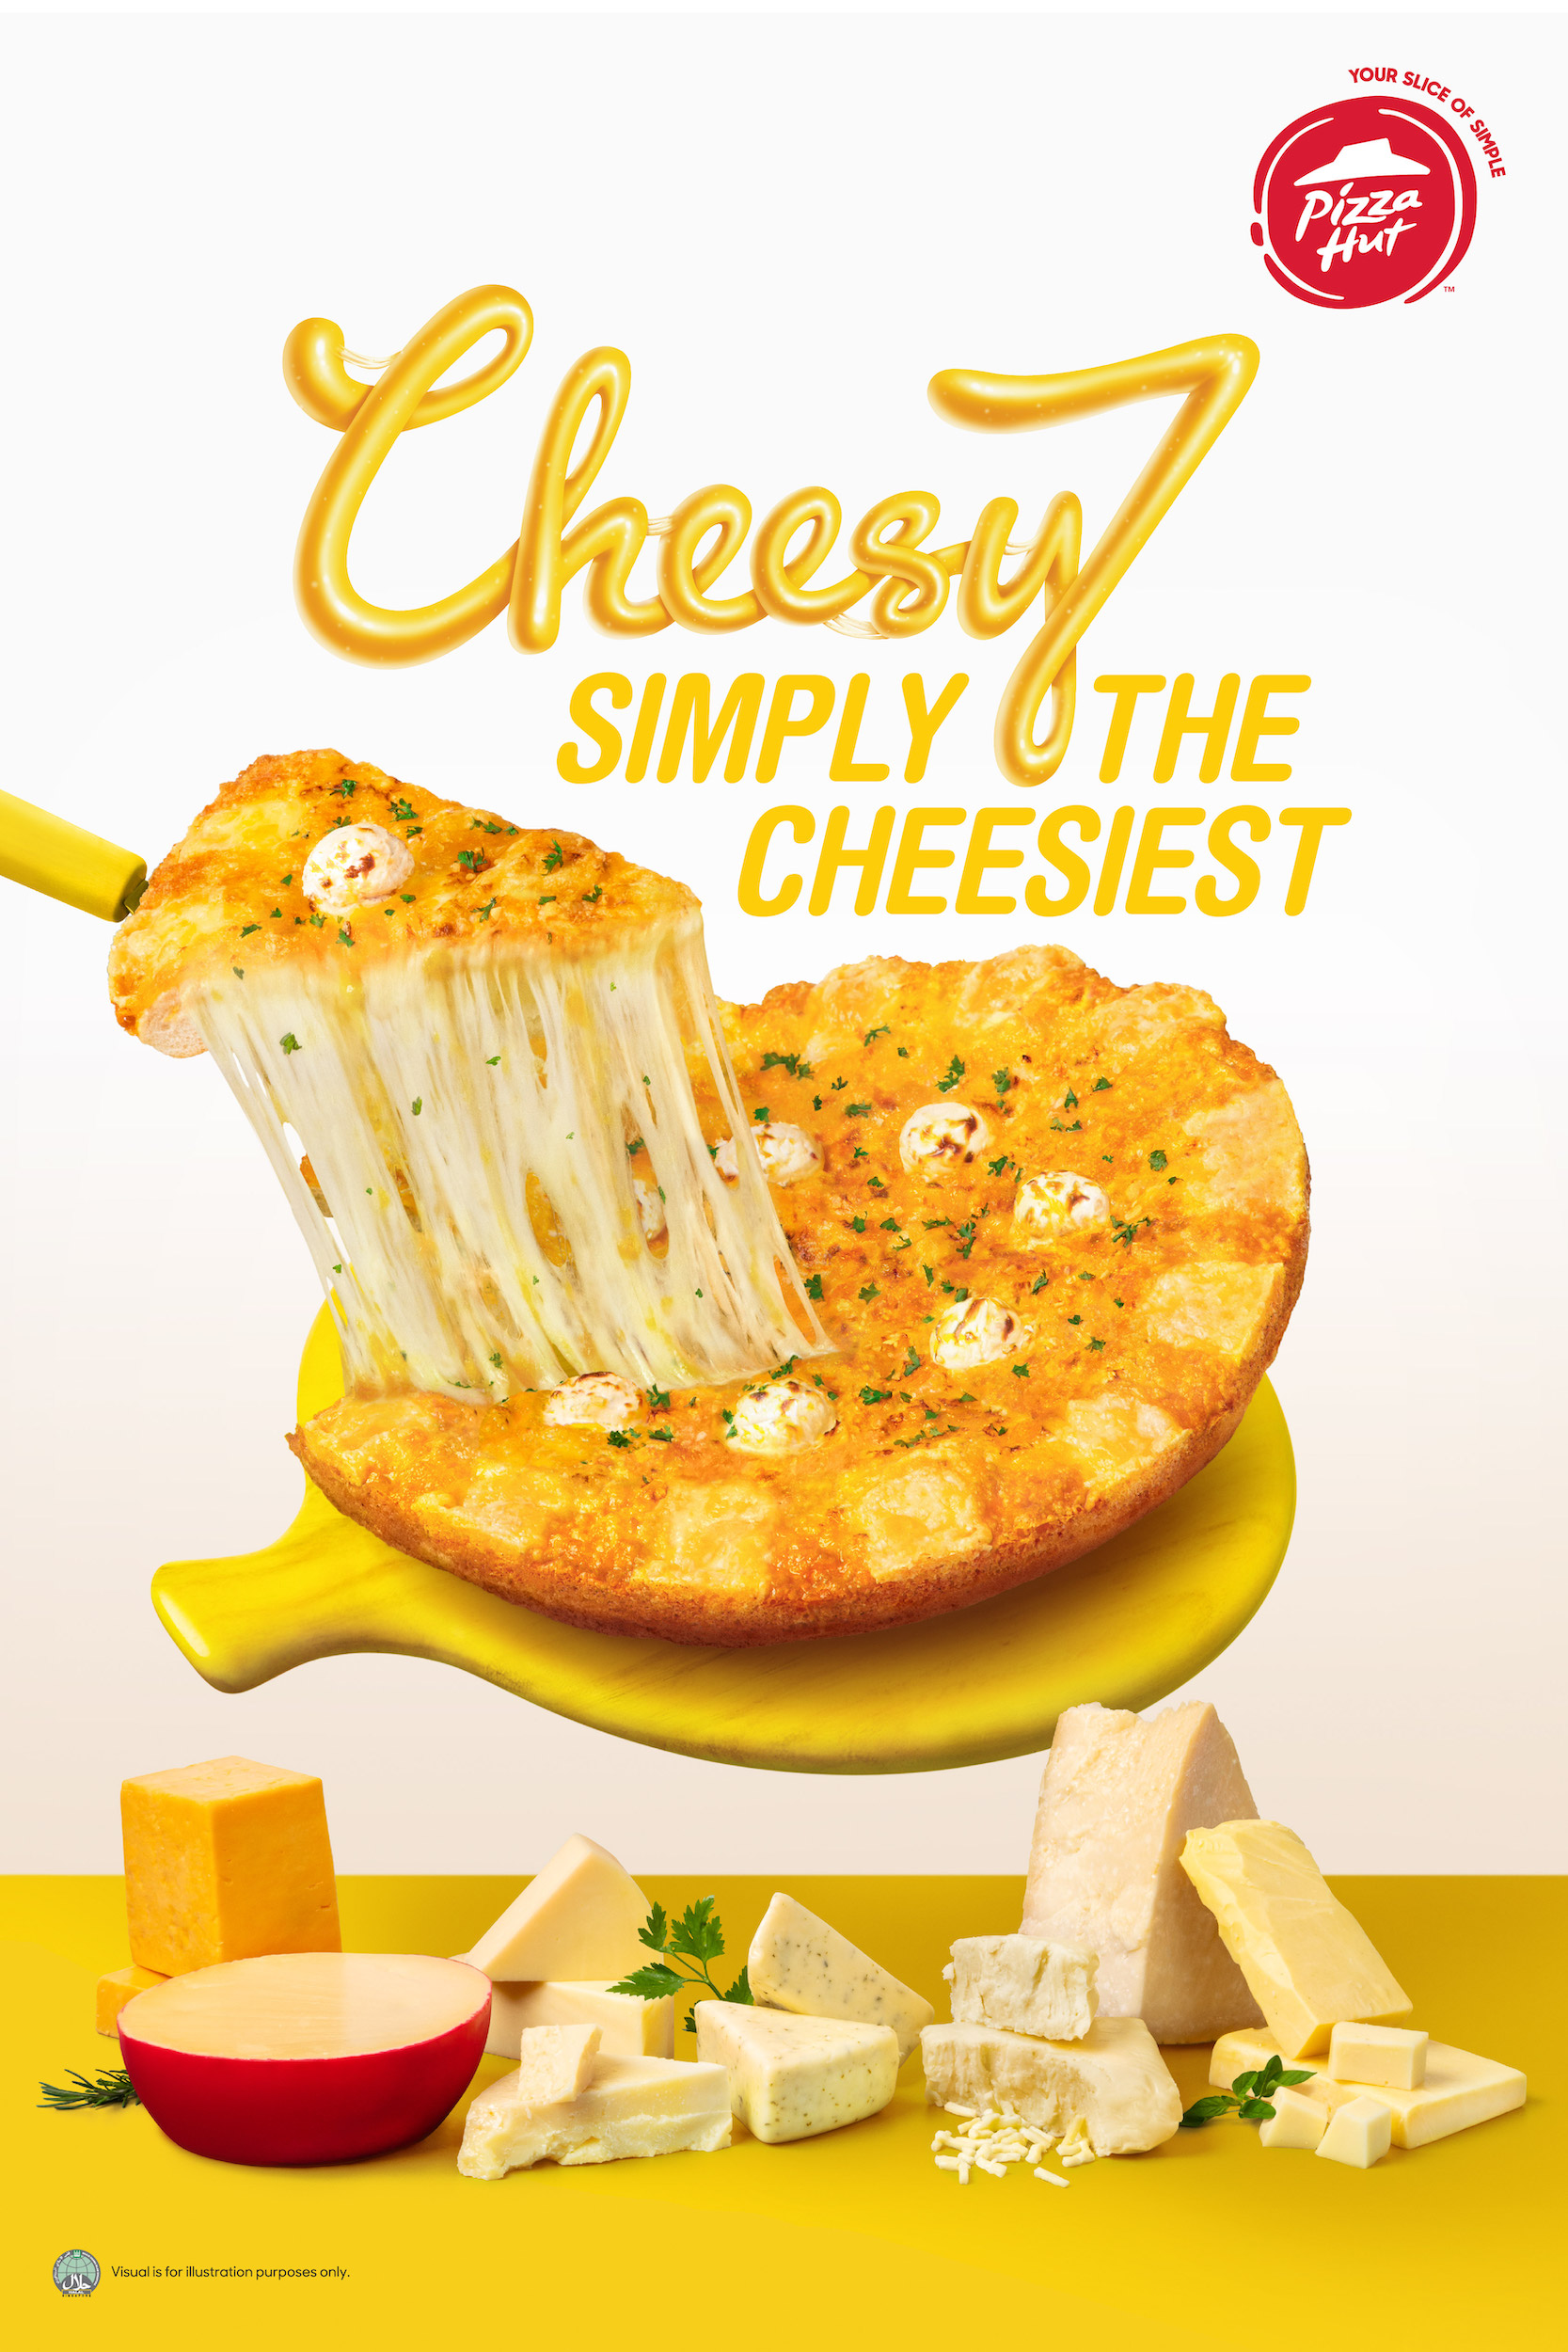 Cheesy 7 KV - Simply The Cheesiest 2.jpg